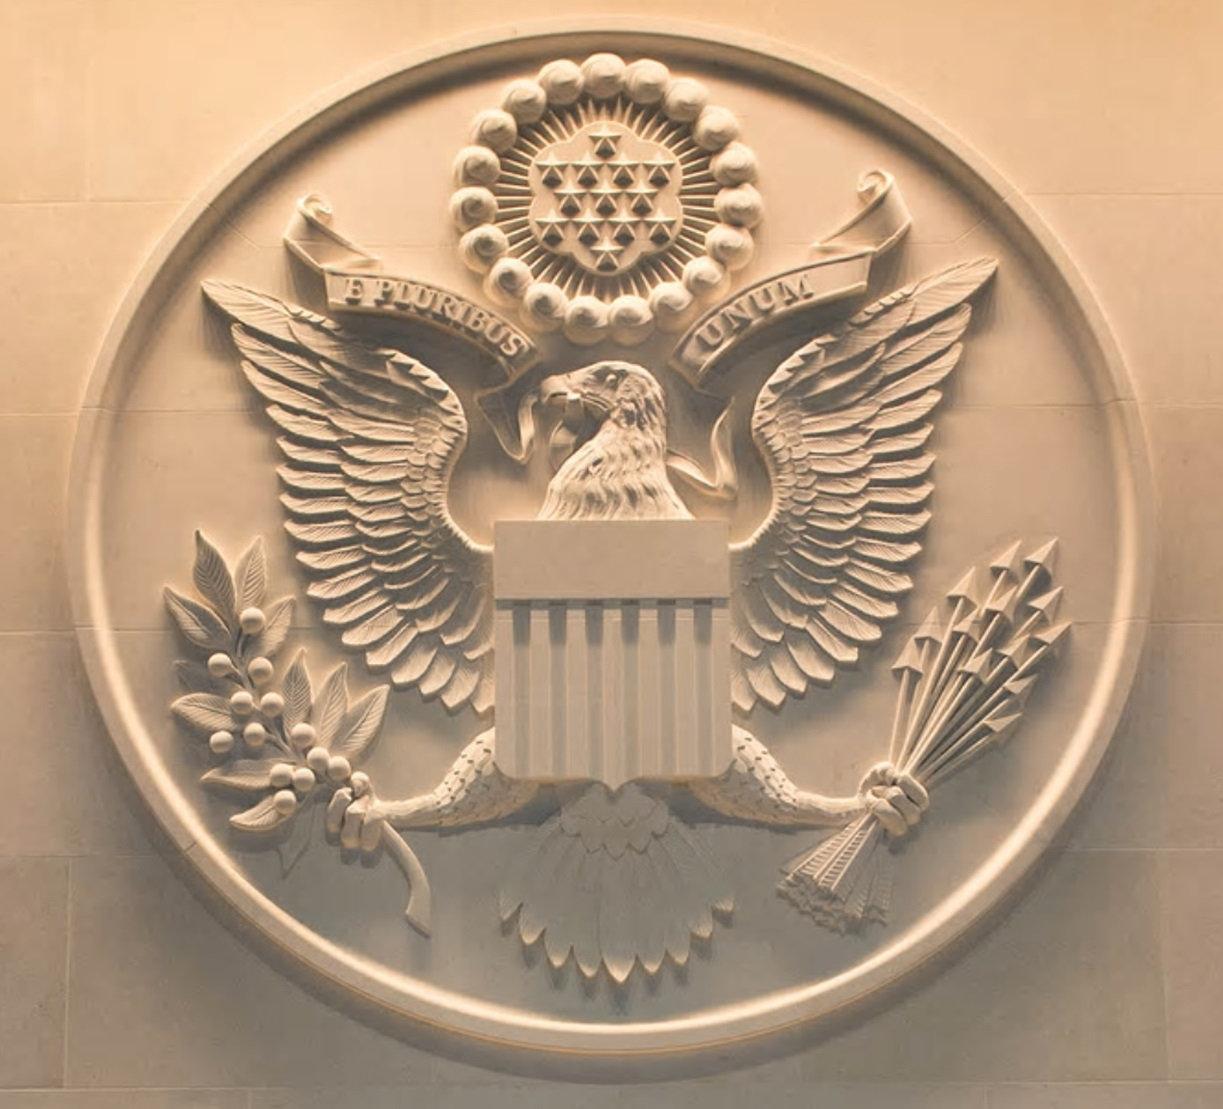 U.S. Embassy - Gallery (2)